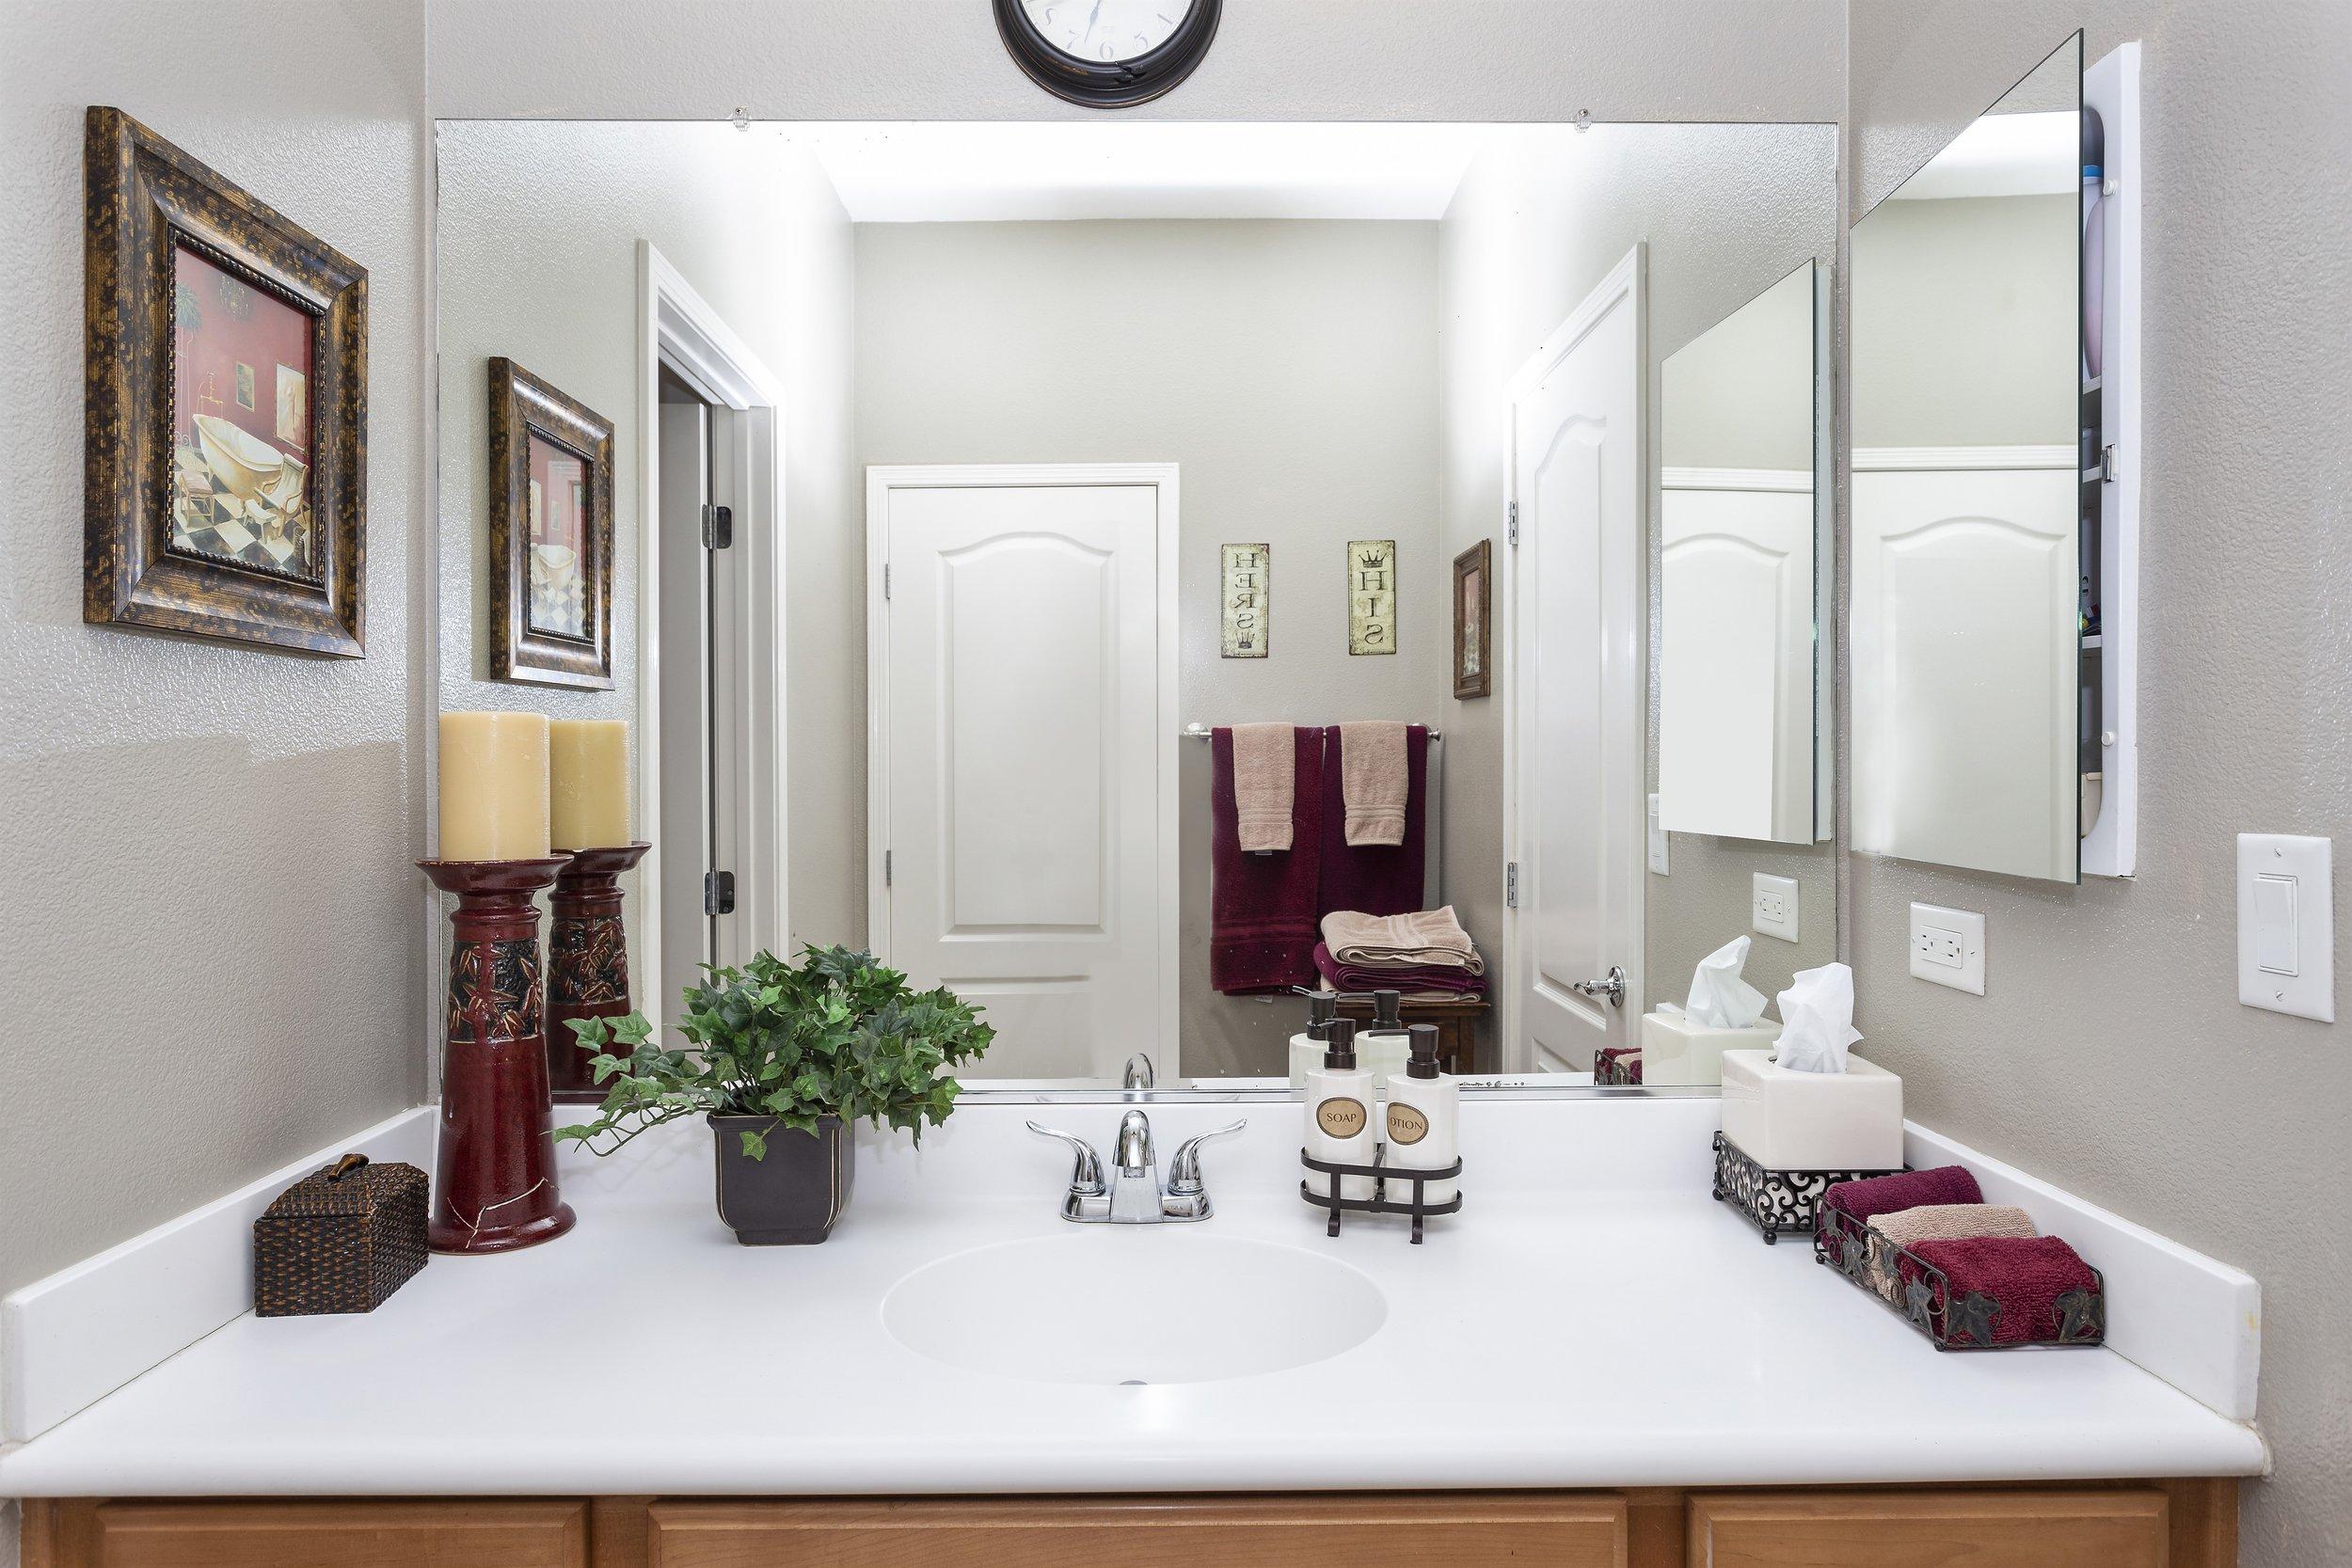 030_2nd Floor Bathroom.jpg